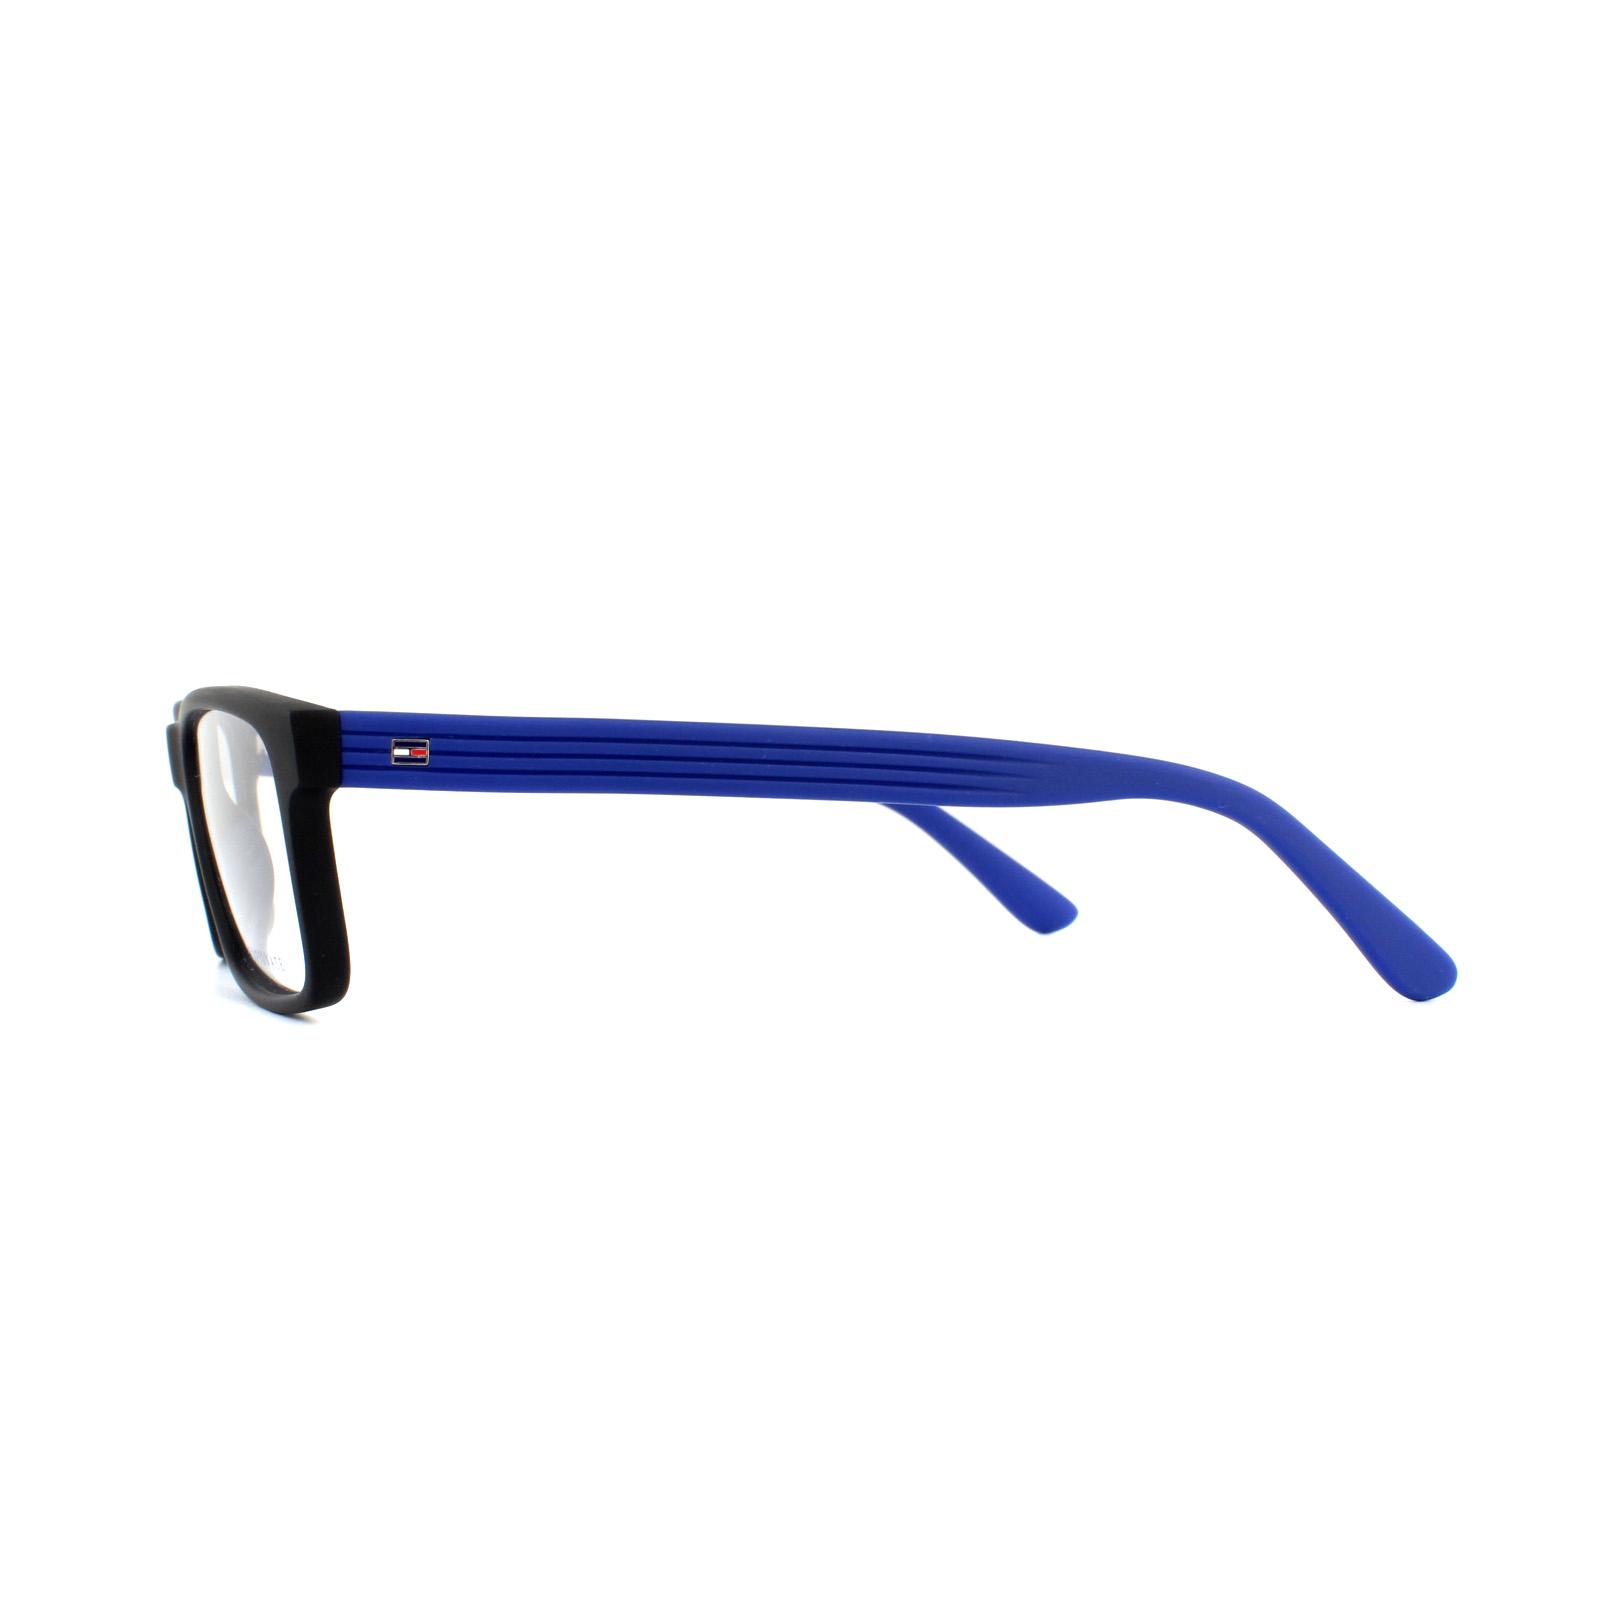 ea398705bb3 Tommy Hilfiger Glasses Frames TH 1278 FB1 Black 53mm 762753590480